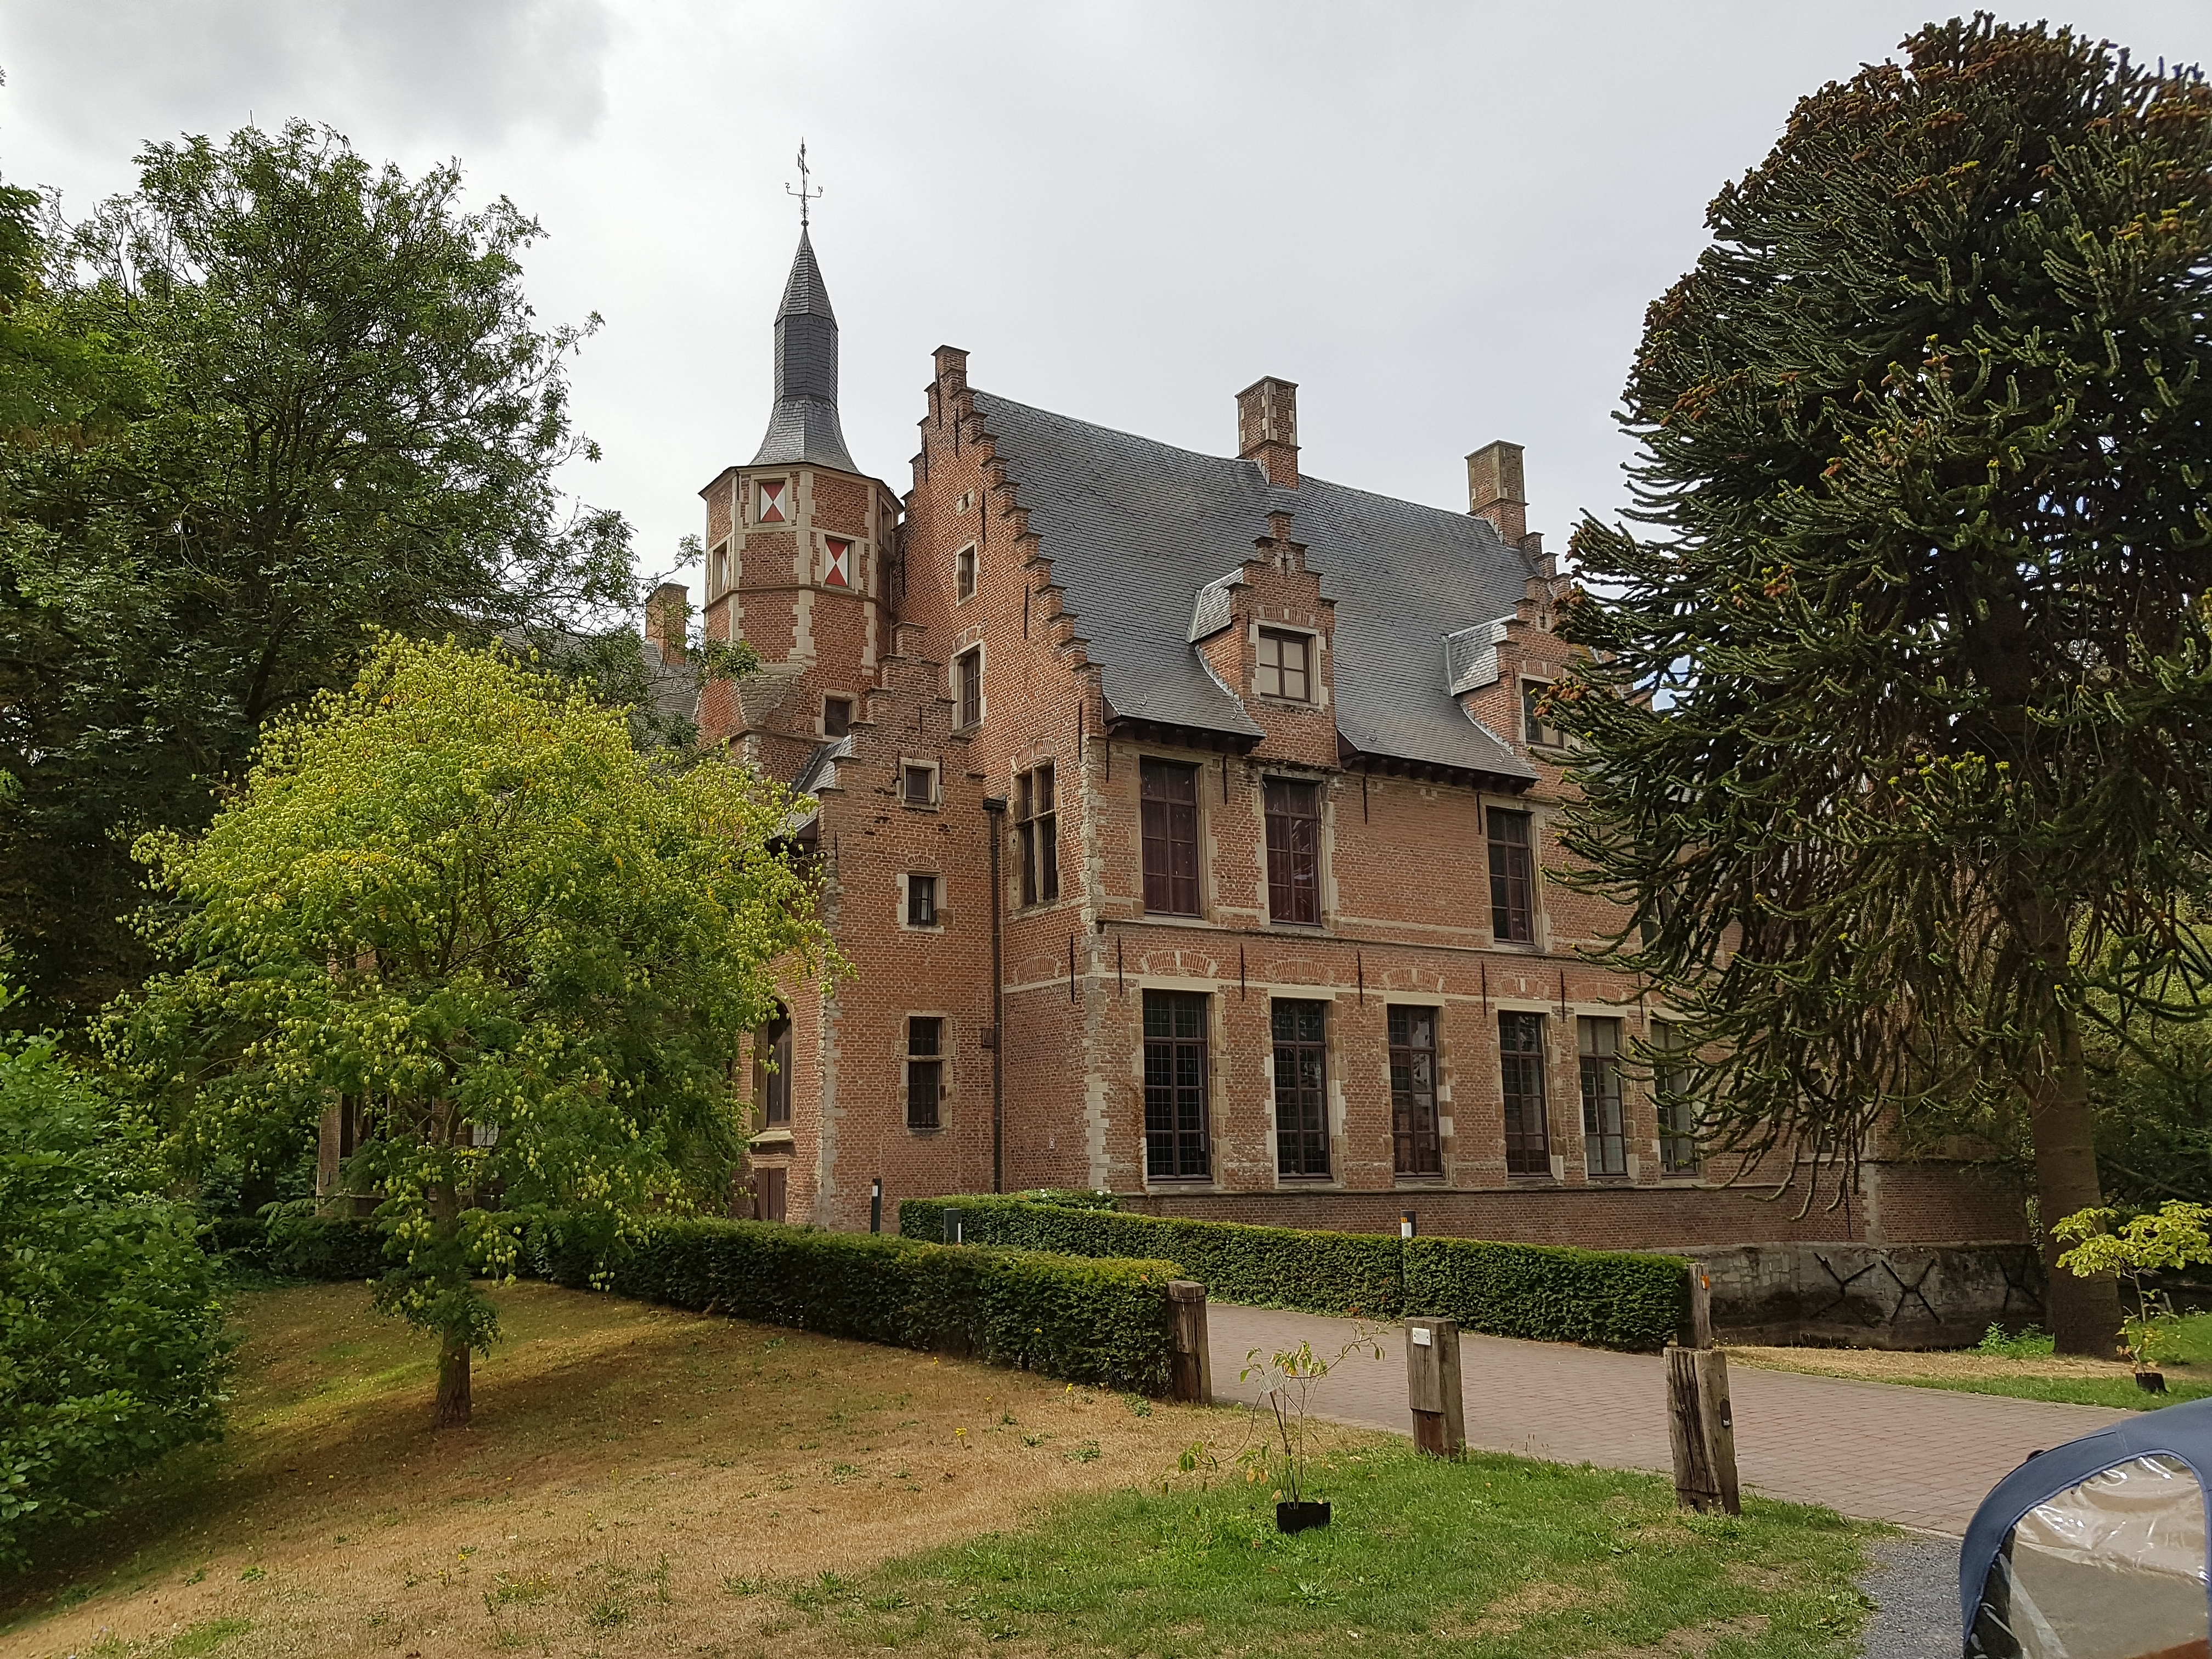 Romain de Vidtspark - Kasteel Walburg